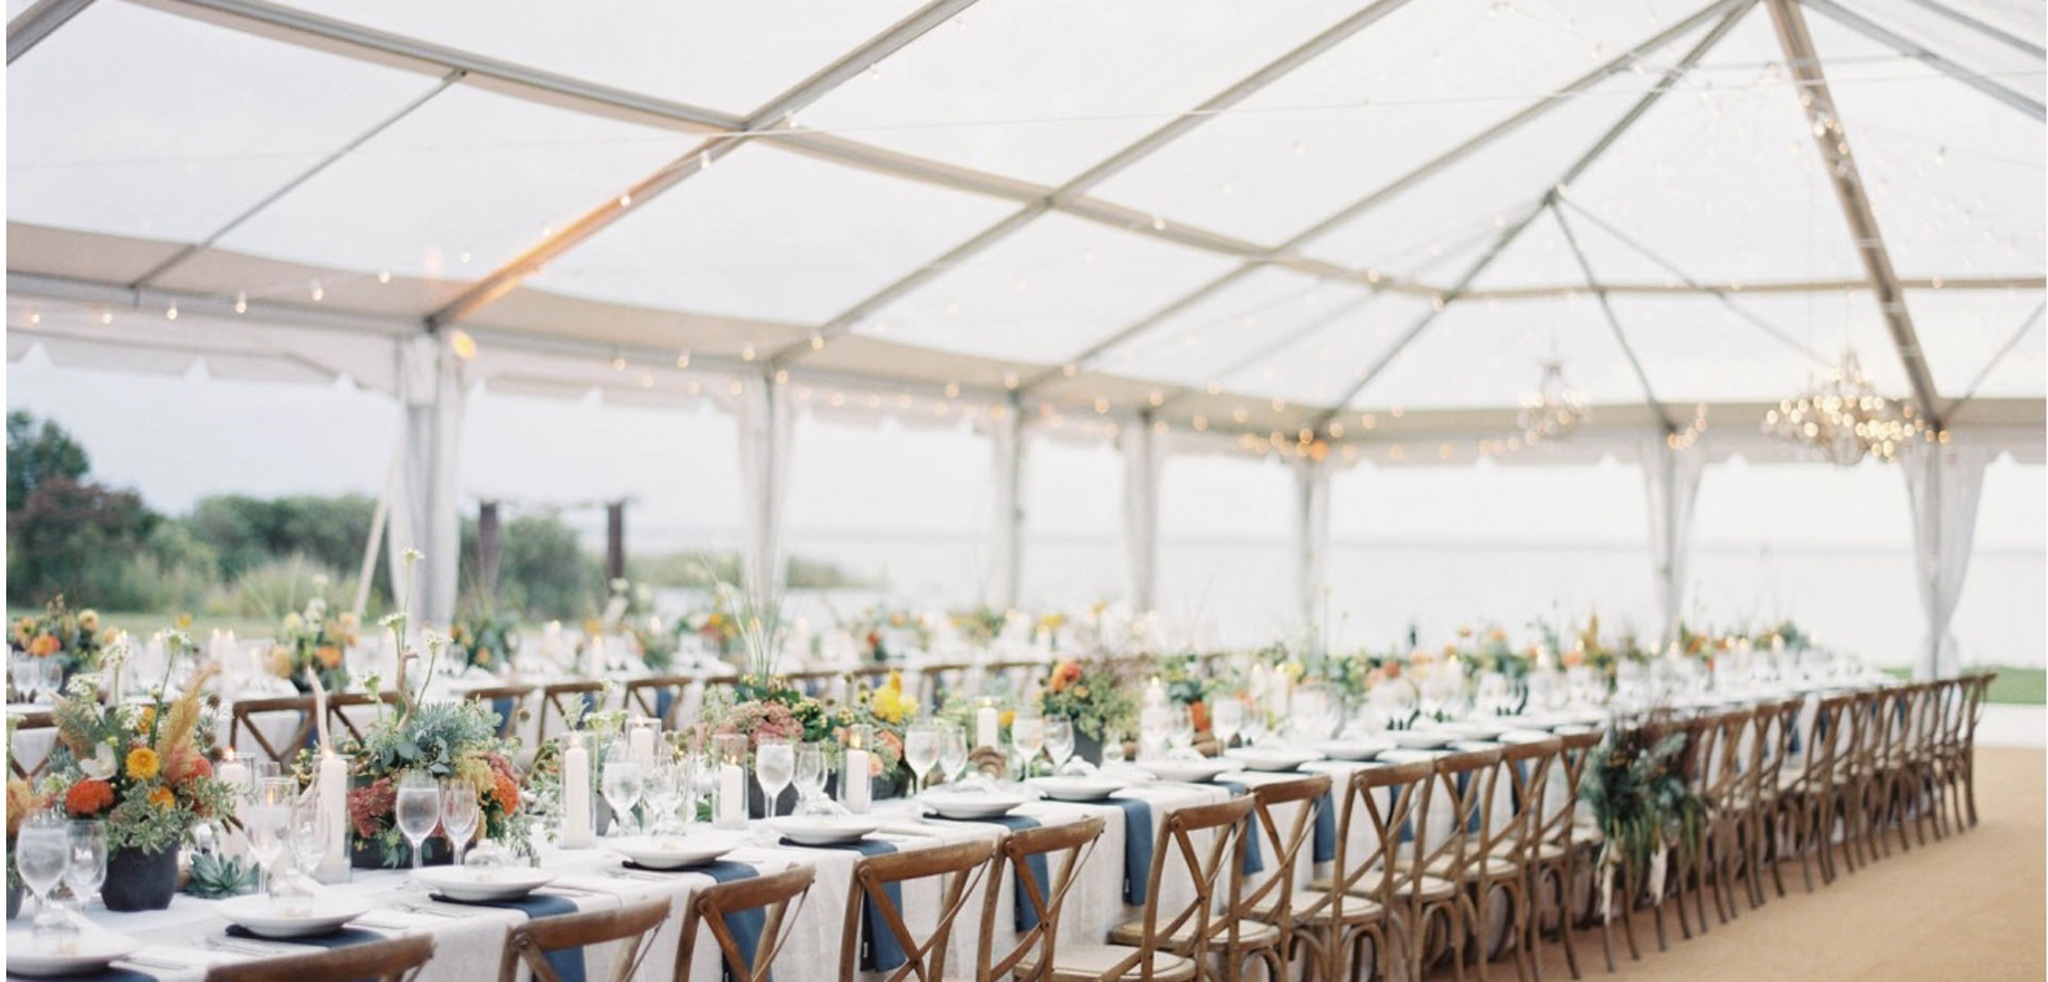 clear banquet tent